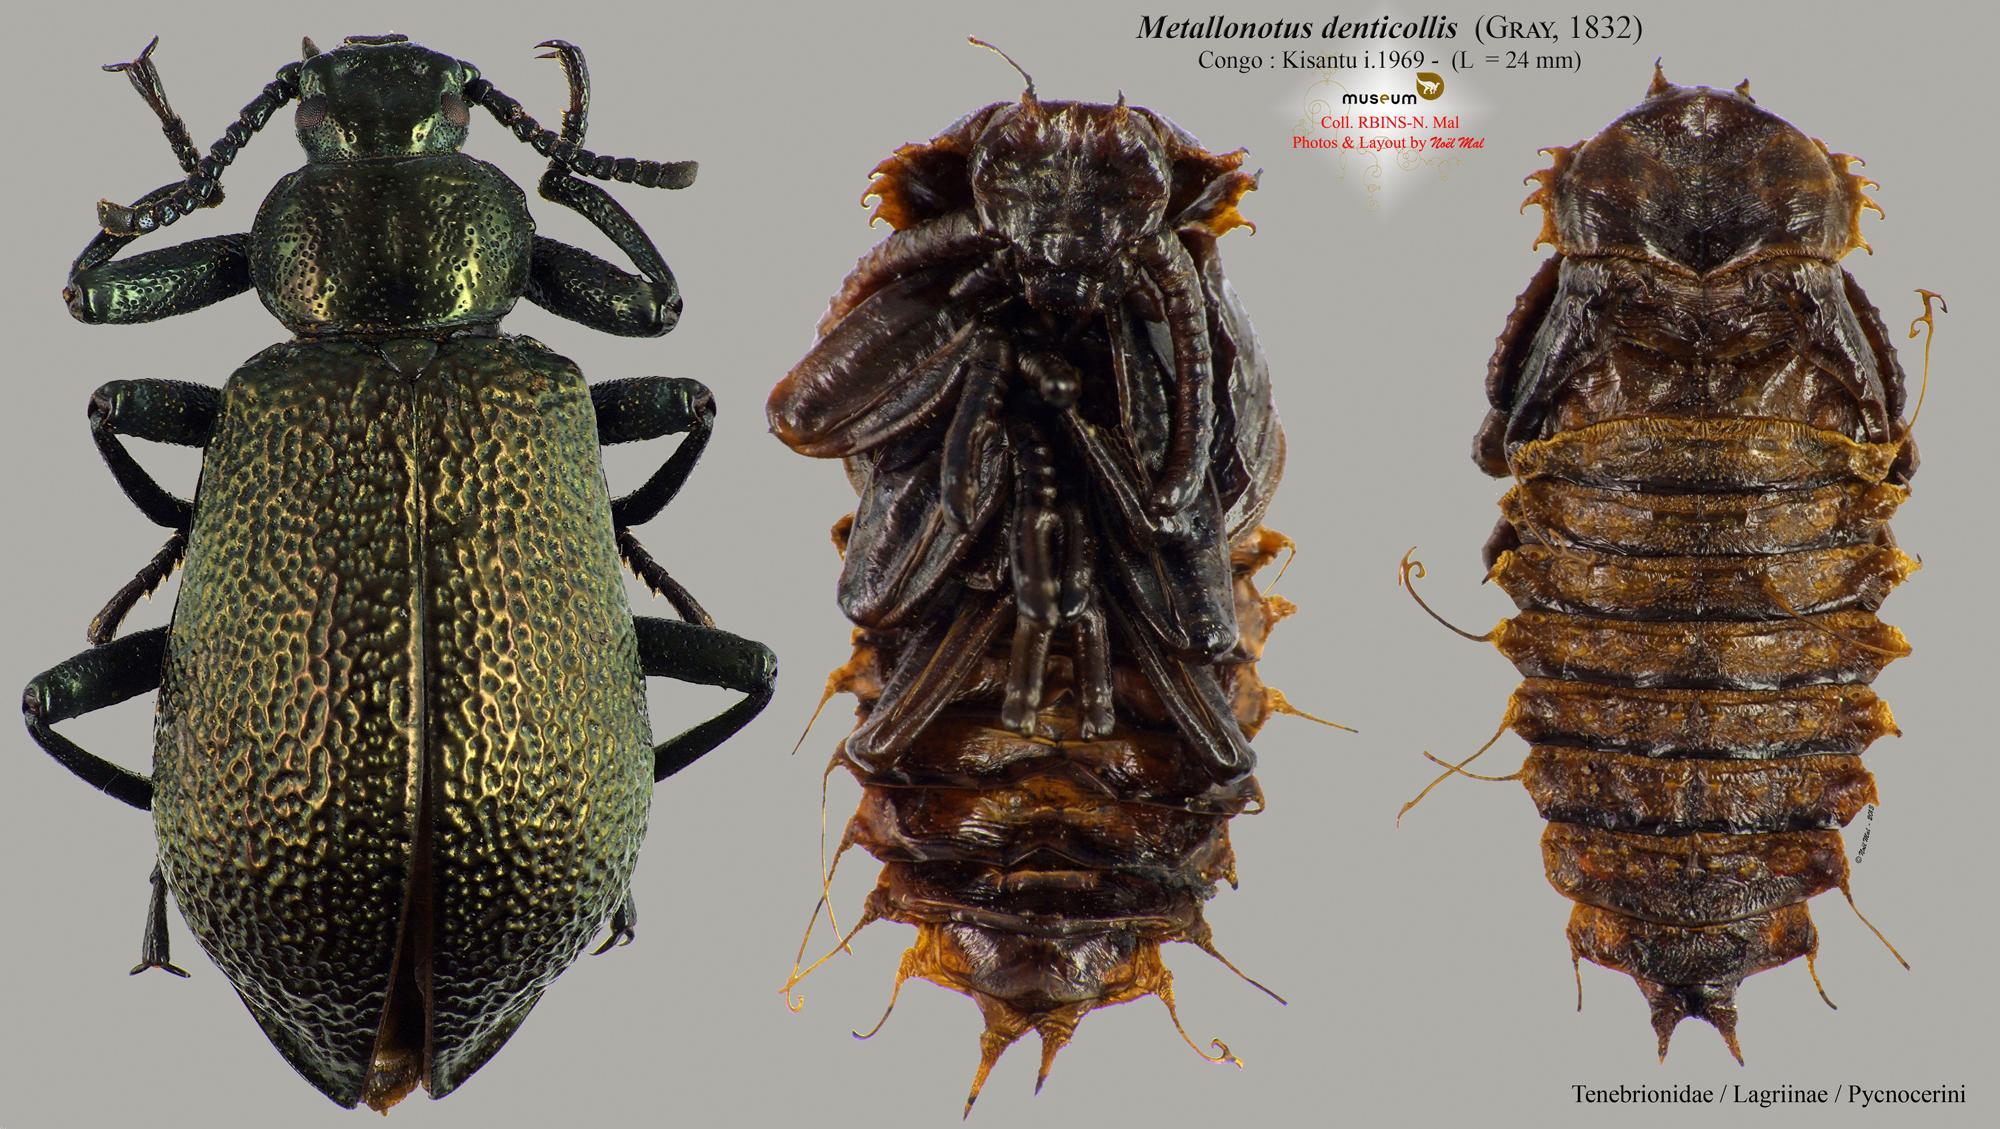 Metallonotus denticollis.jpg